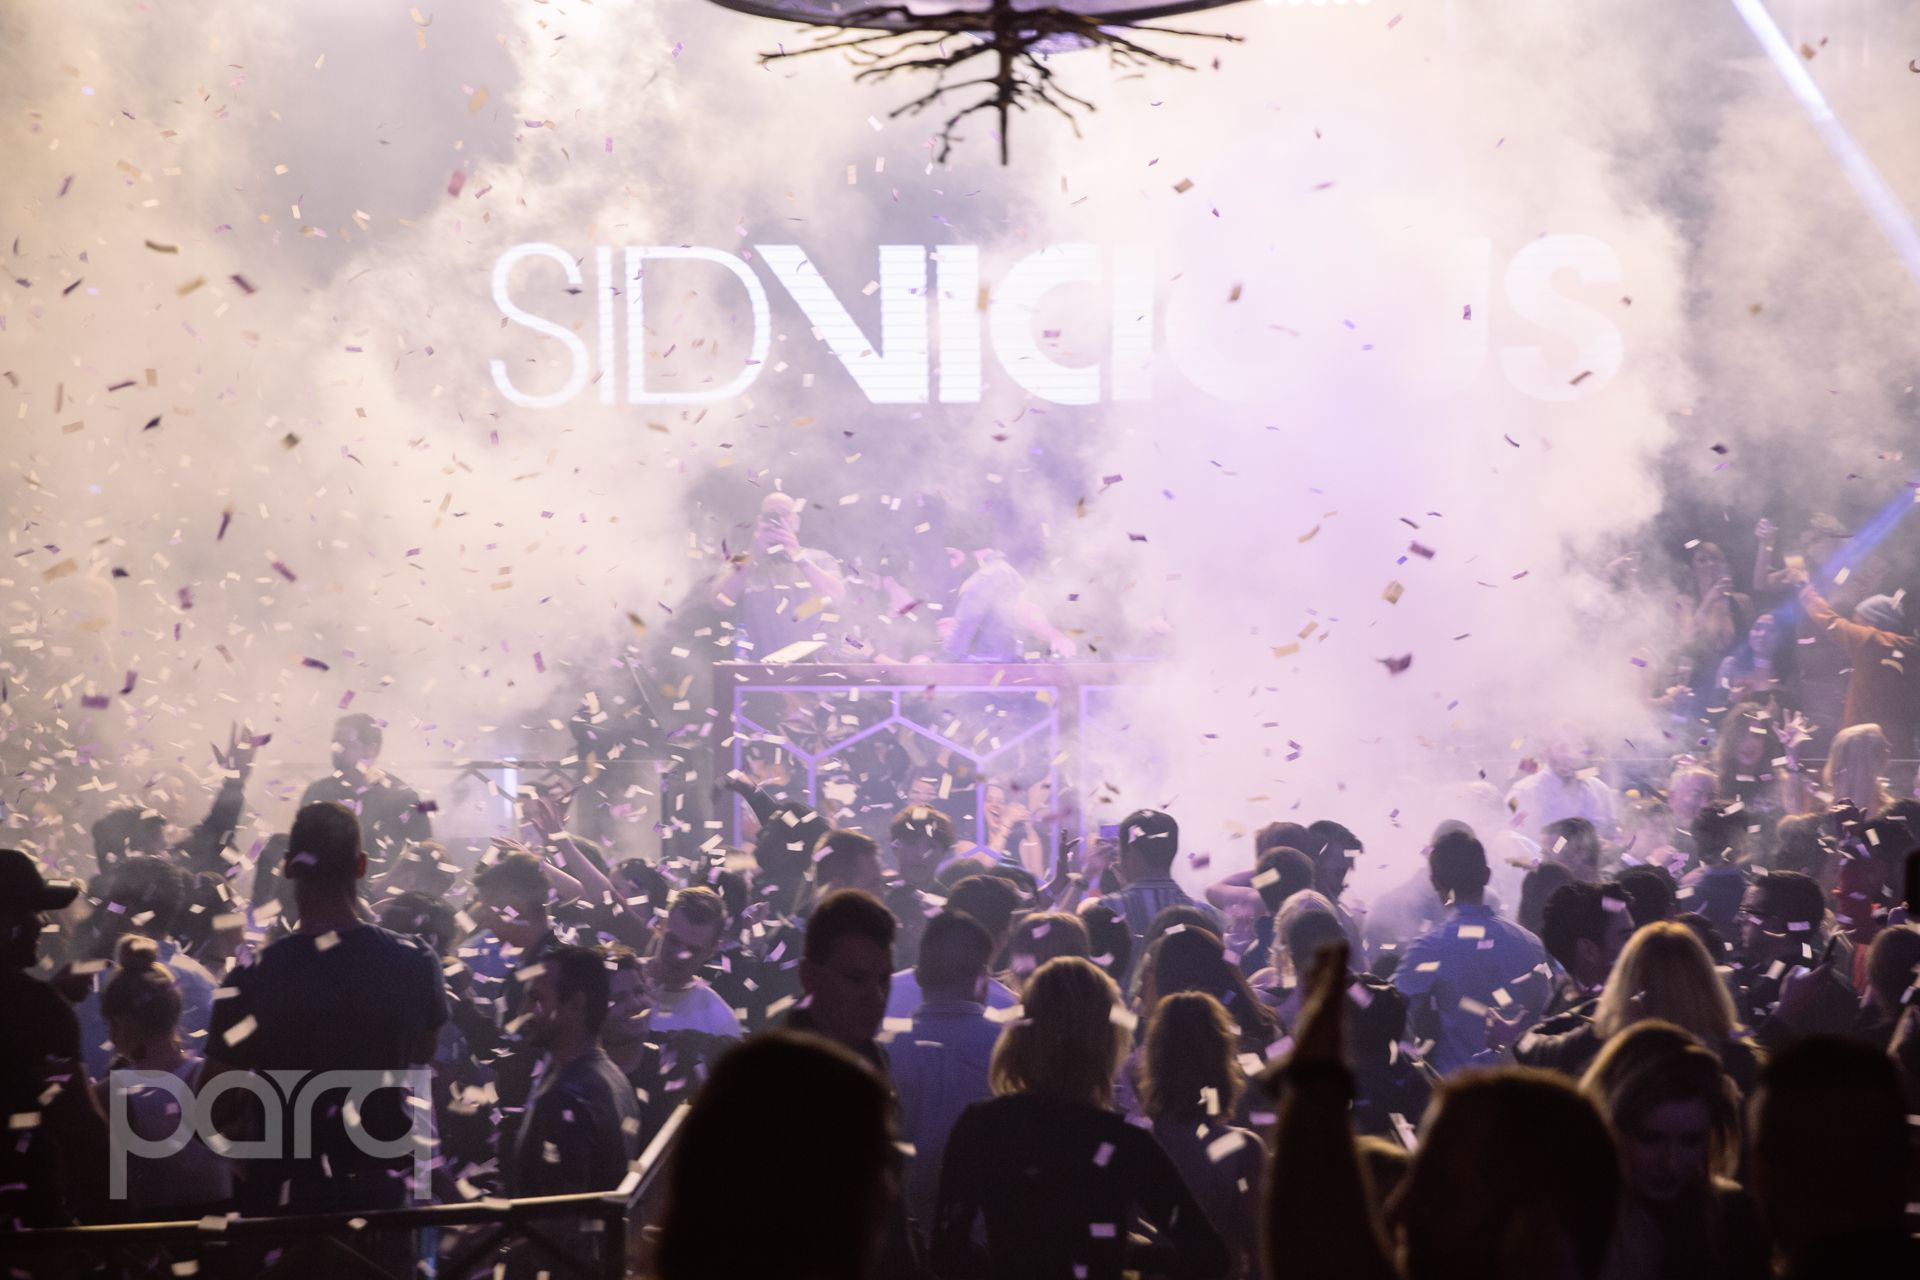 San-Diego-Nightclub-Sid Vicious-8.jpg